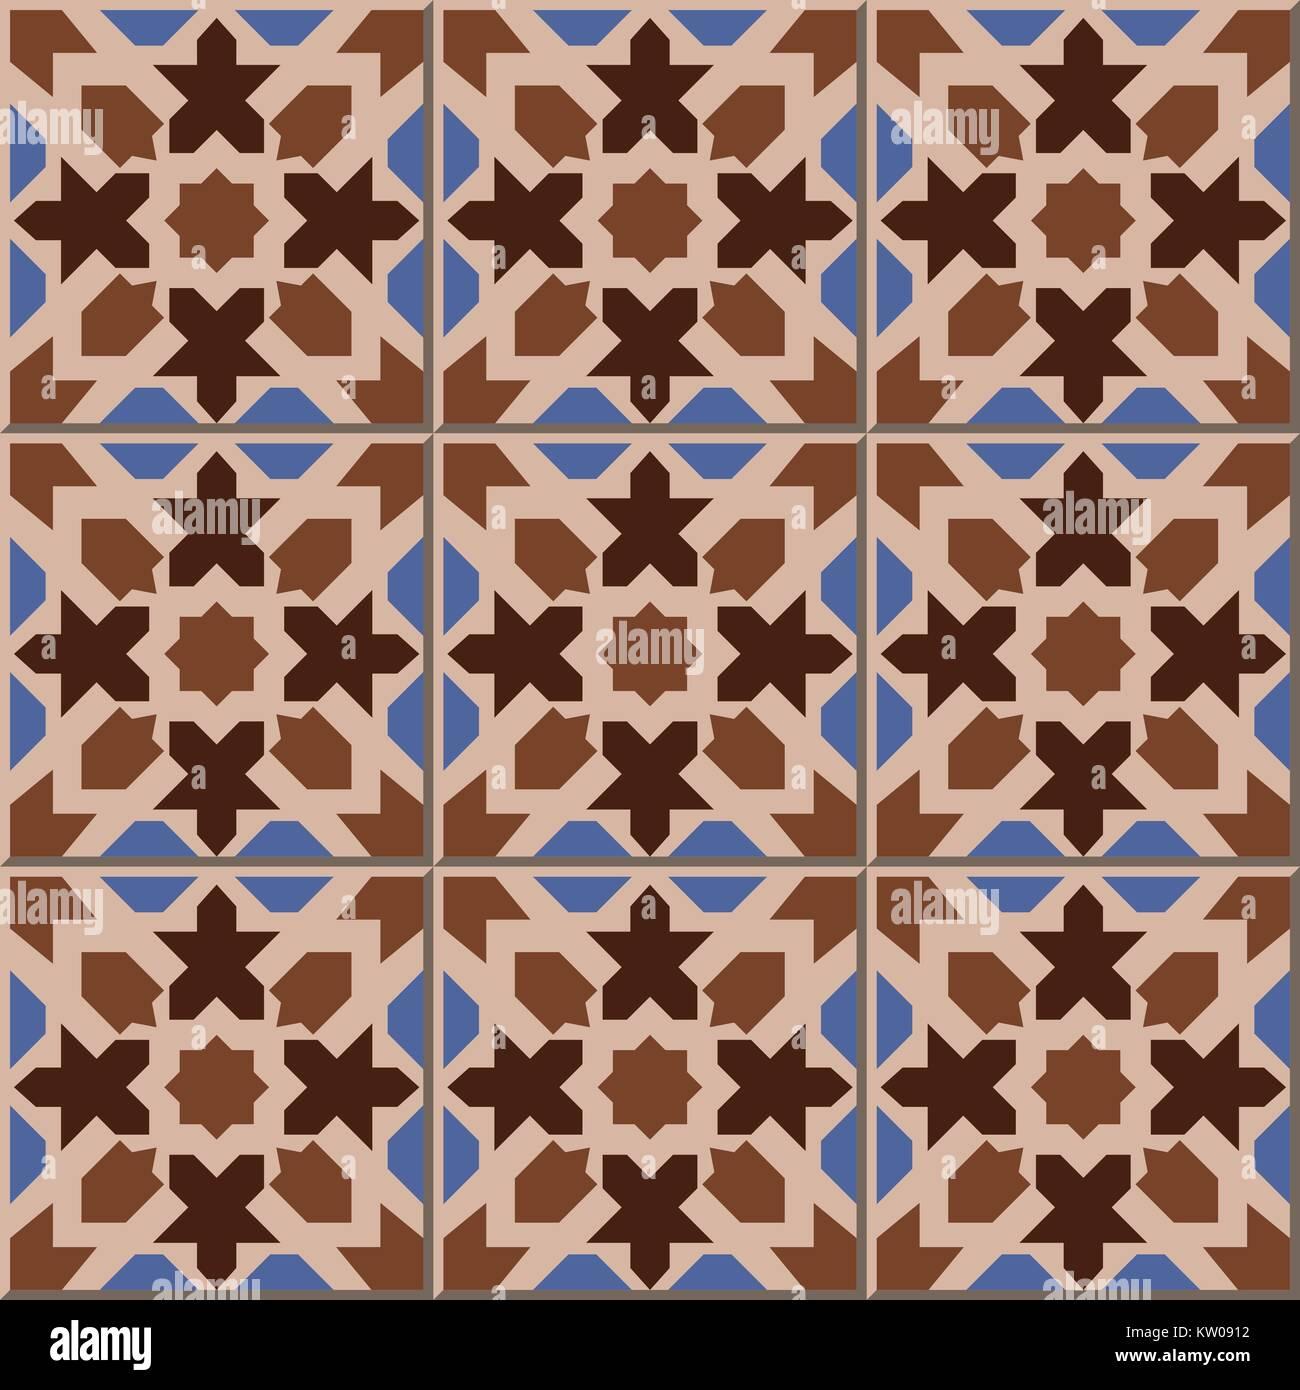 Islamic tile star stock photos islamic tile star stock images ceramic tile pattern of islamic brown geometry star shape kaleidoscope stock image dailygadgetfo Choice Image